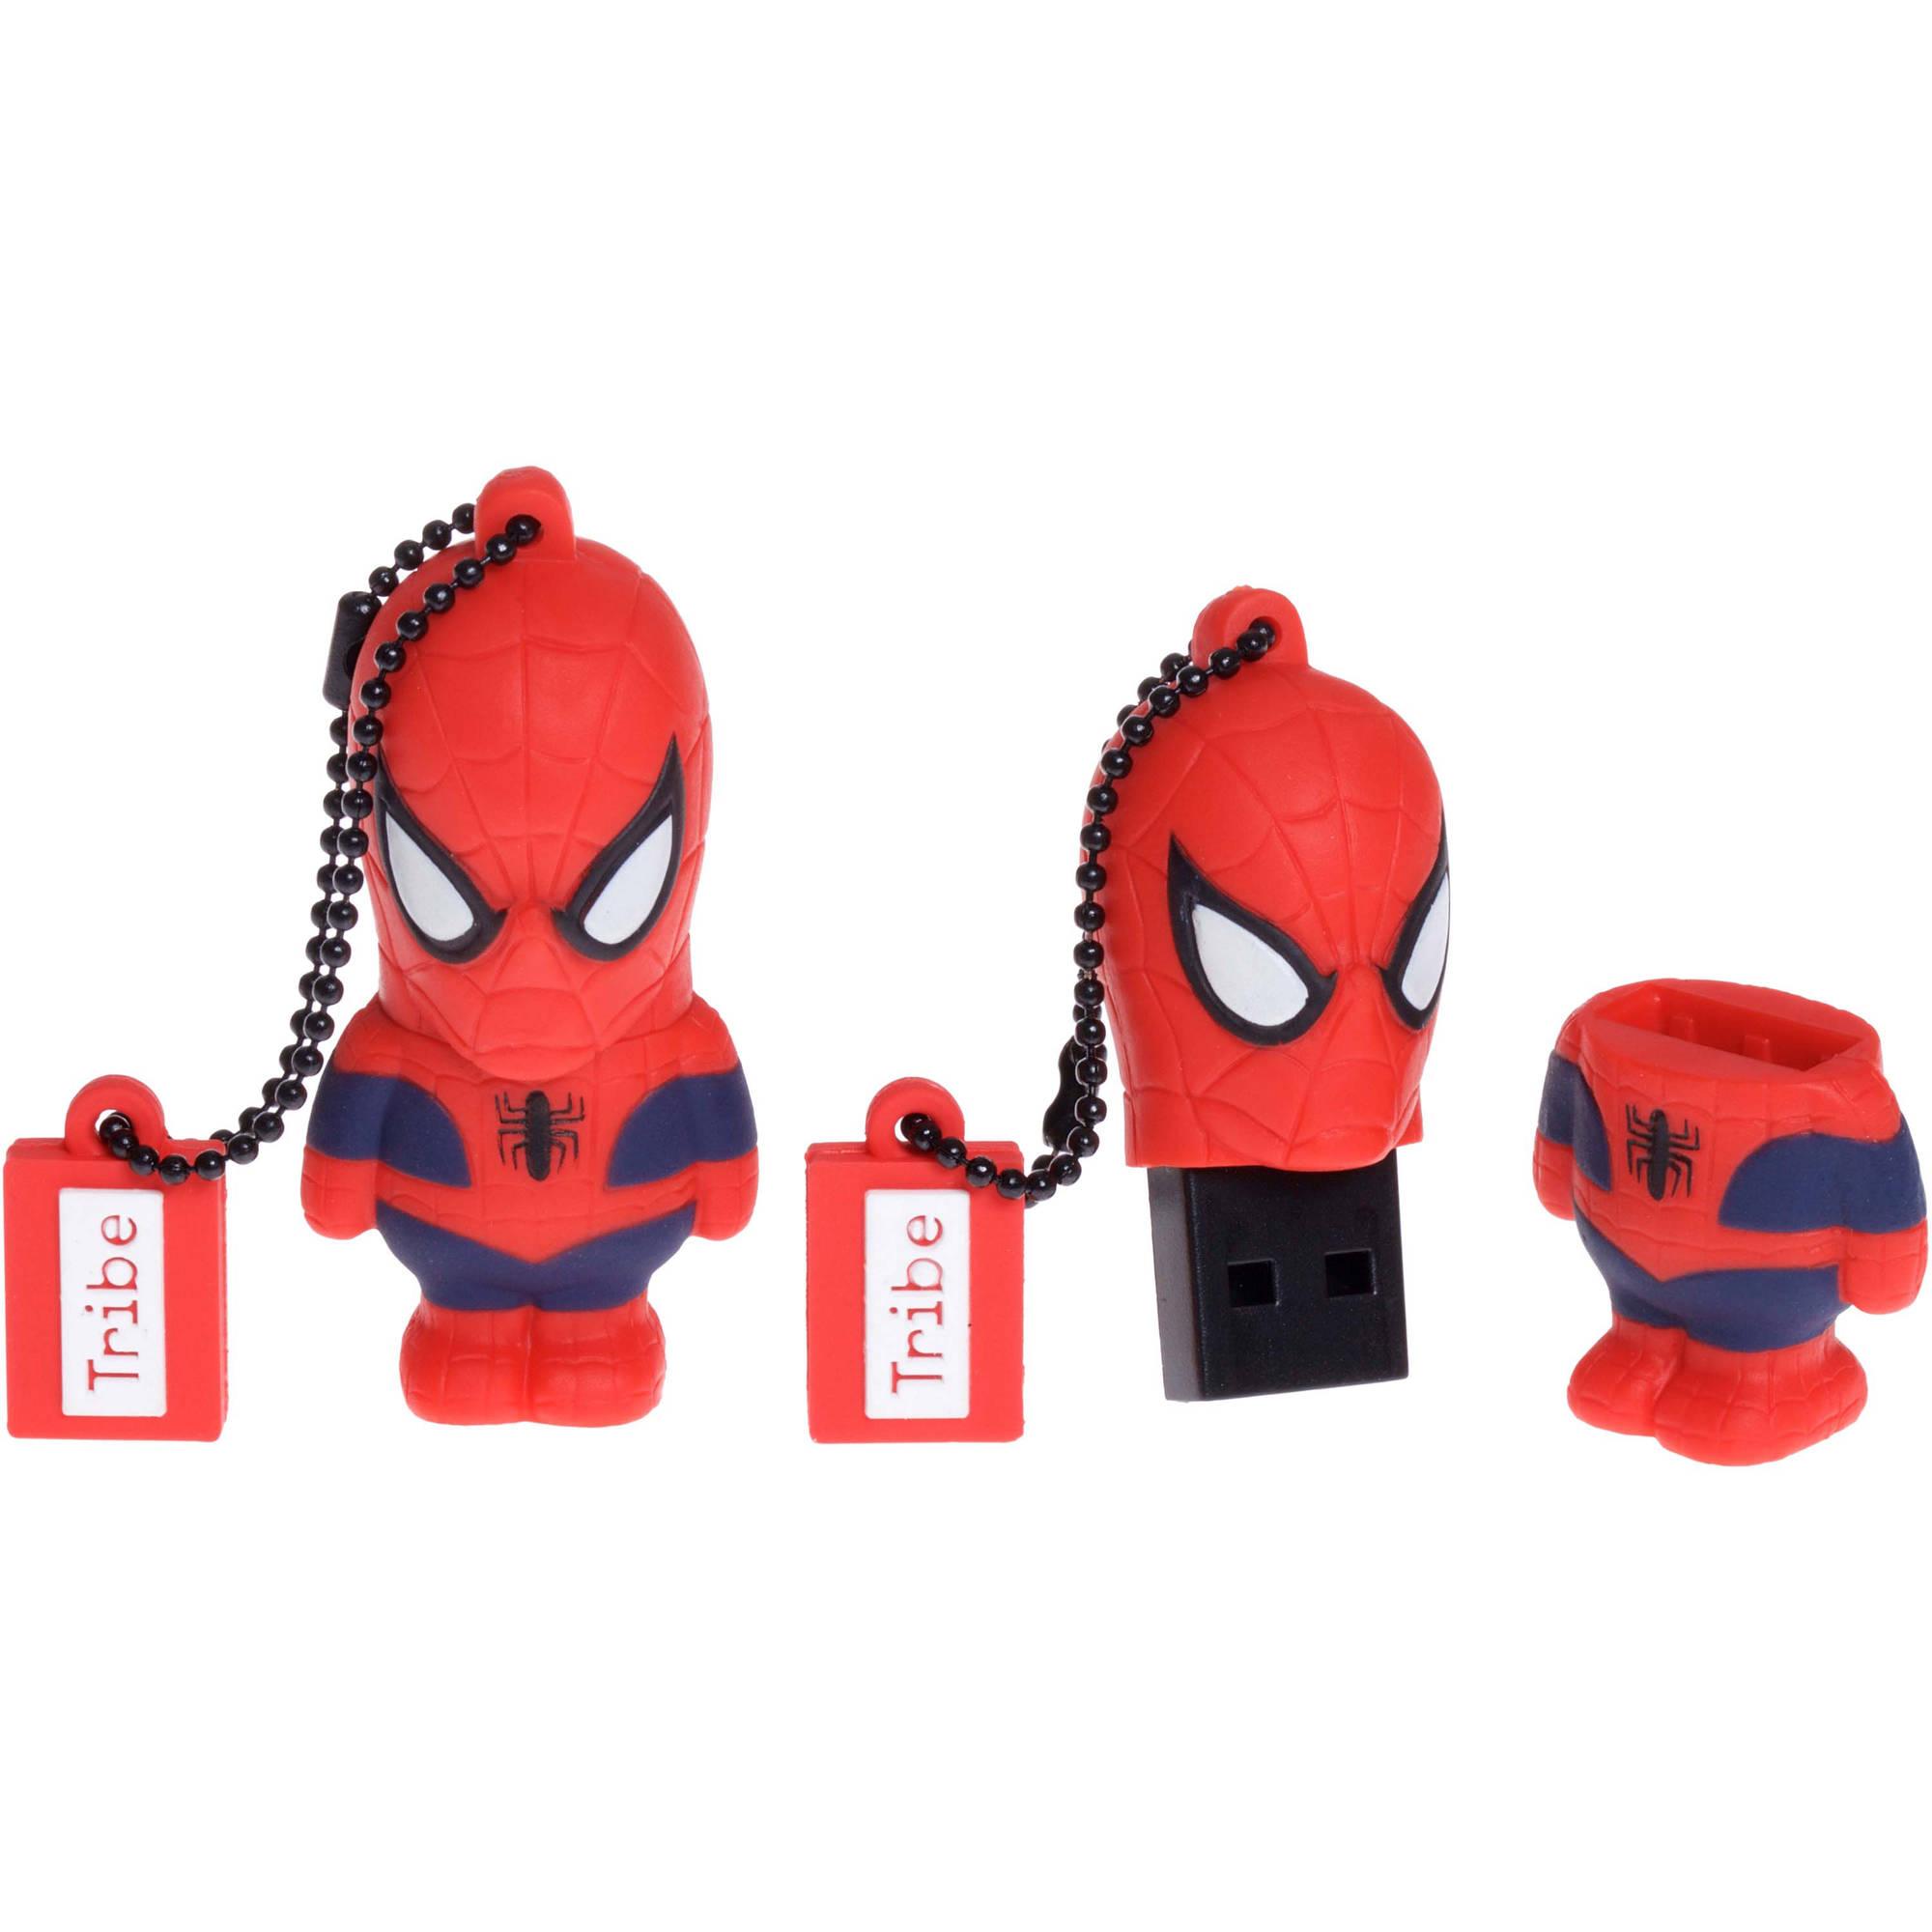 tribe usb flash drive 16gb marvel spiderman collectible